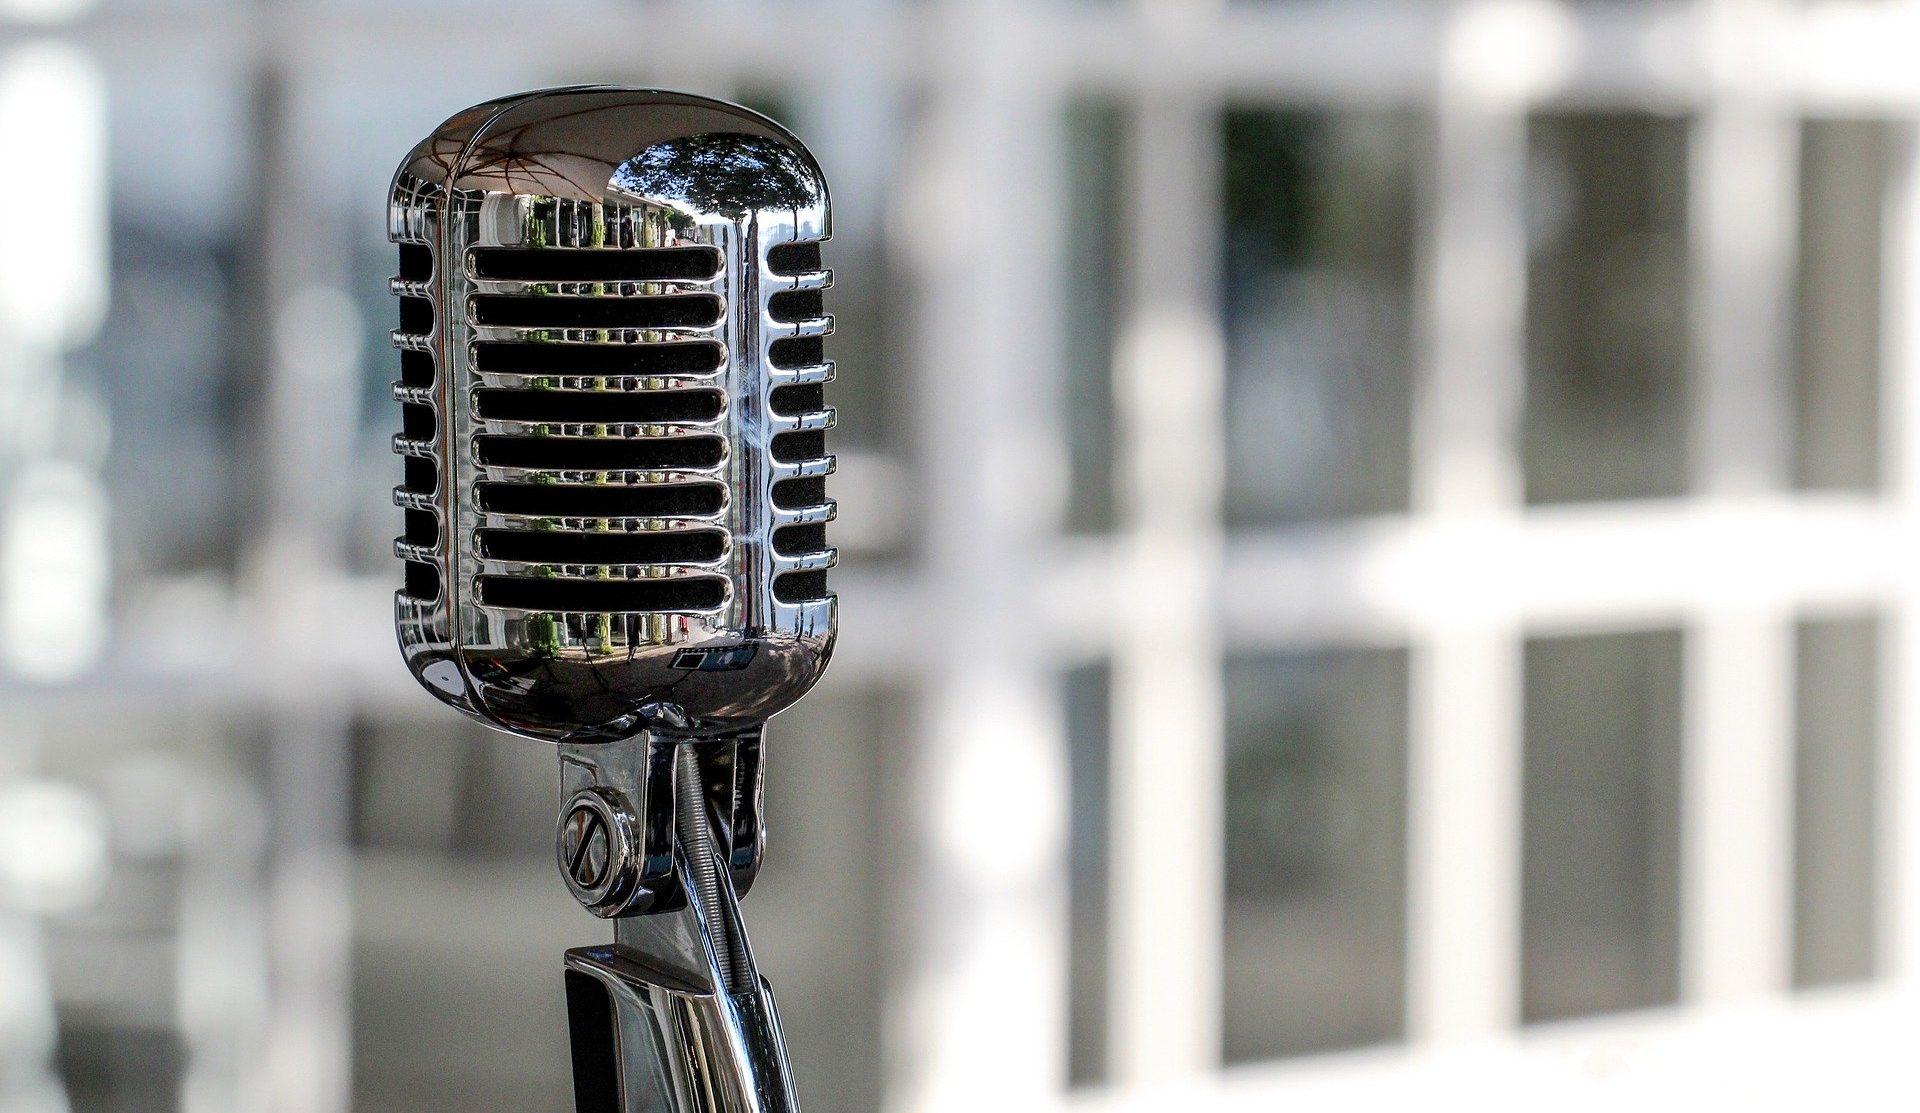 microphone-5340340_1920